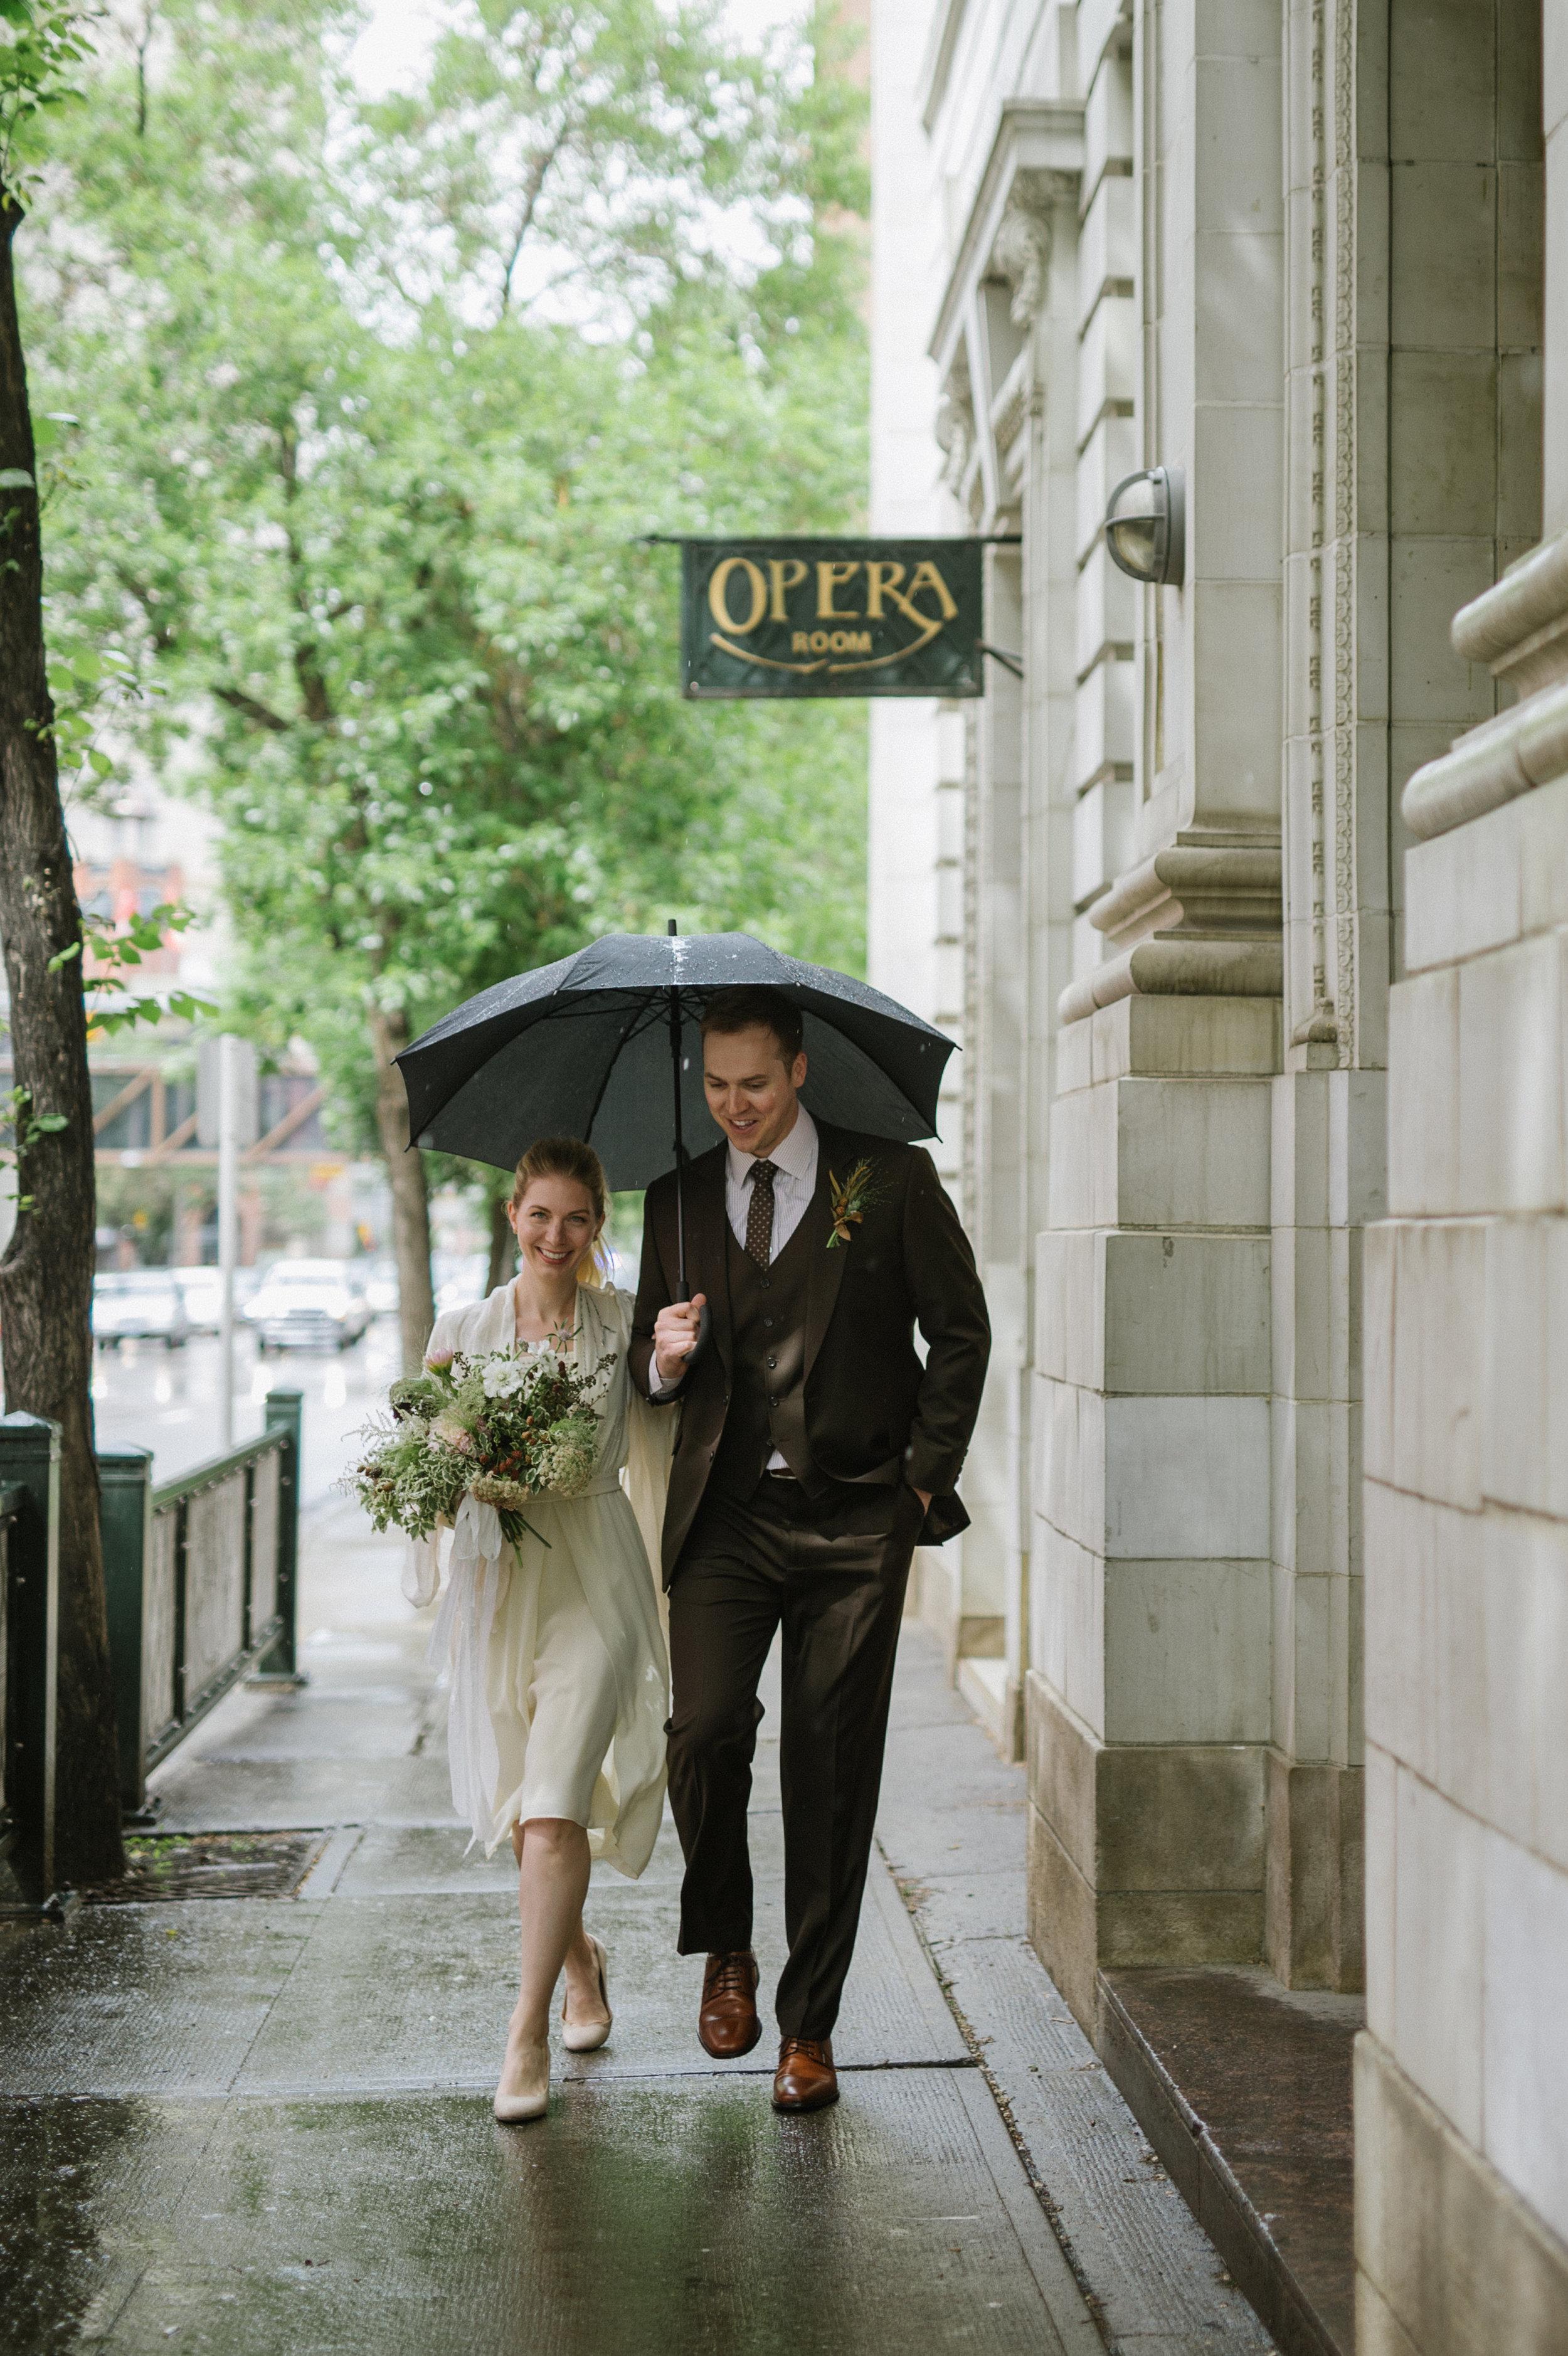 Teatro_Wedding_Calgary_Wedding_Photography_Vanessa_Tom_Married_2018_HR201.jpg